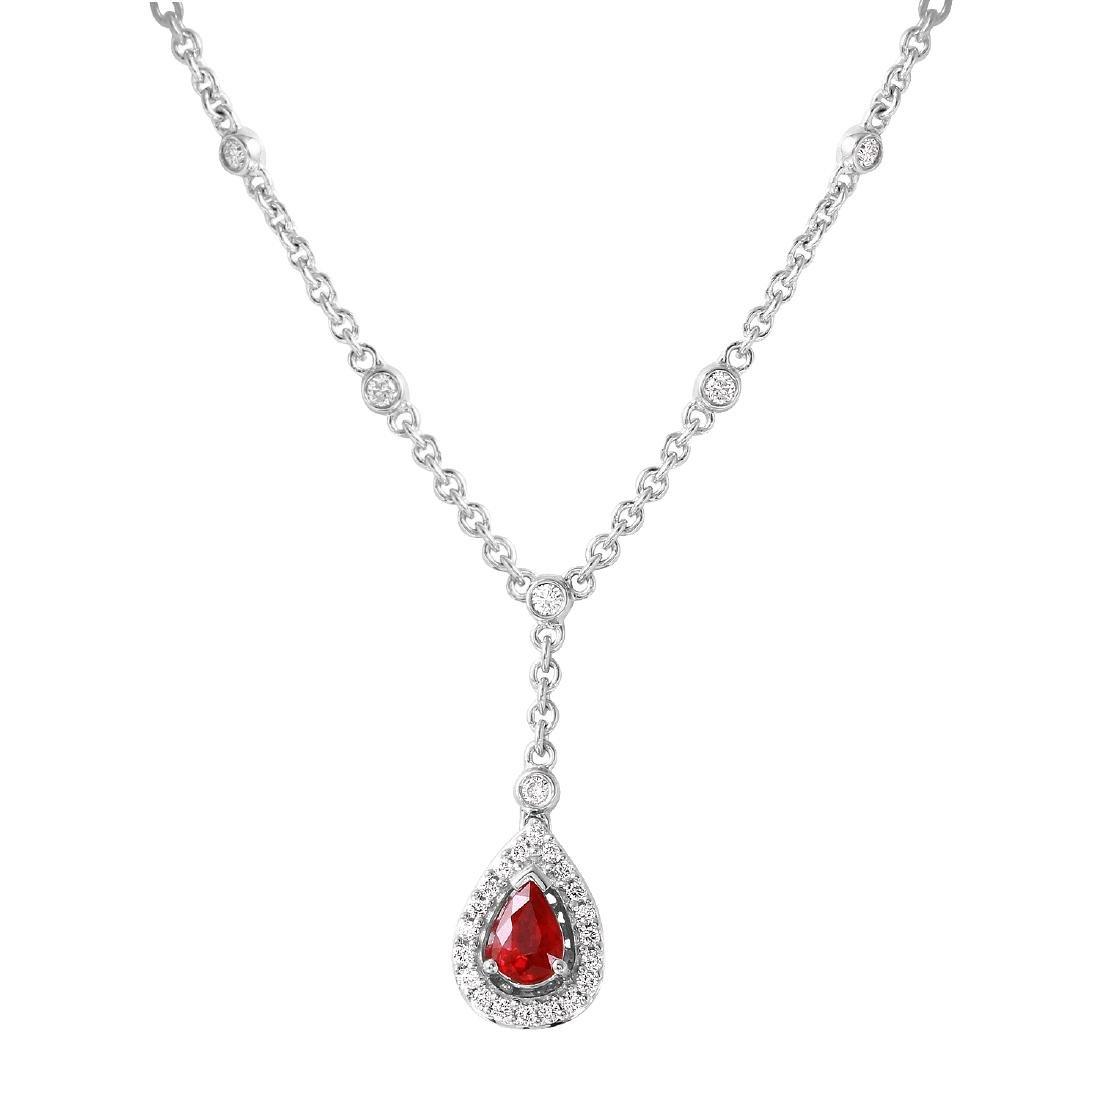 14KT White Gold Ruby & Diamond Necklace - 3